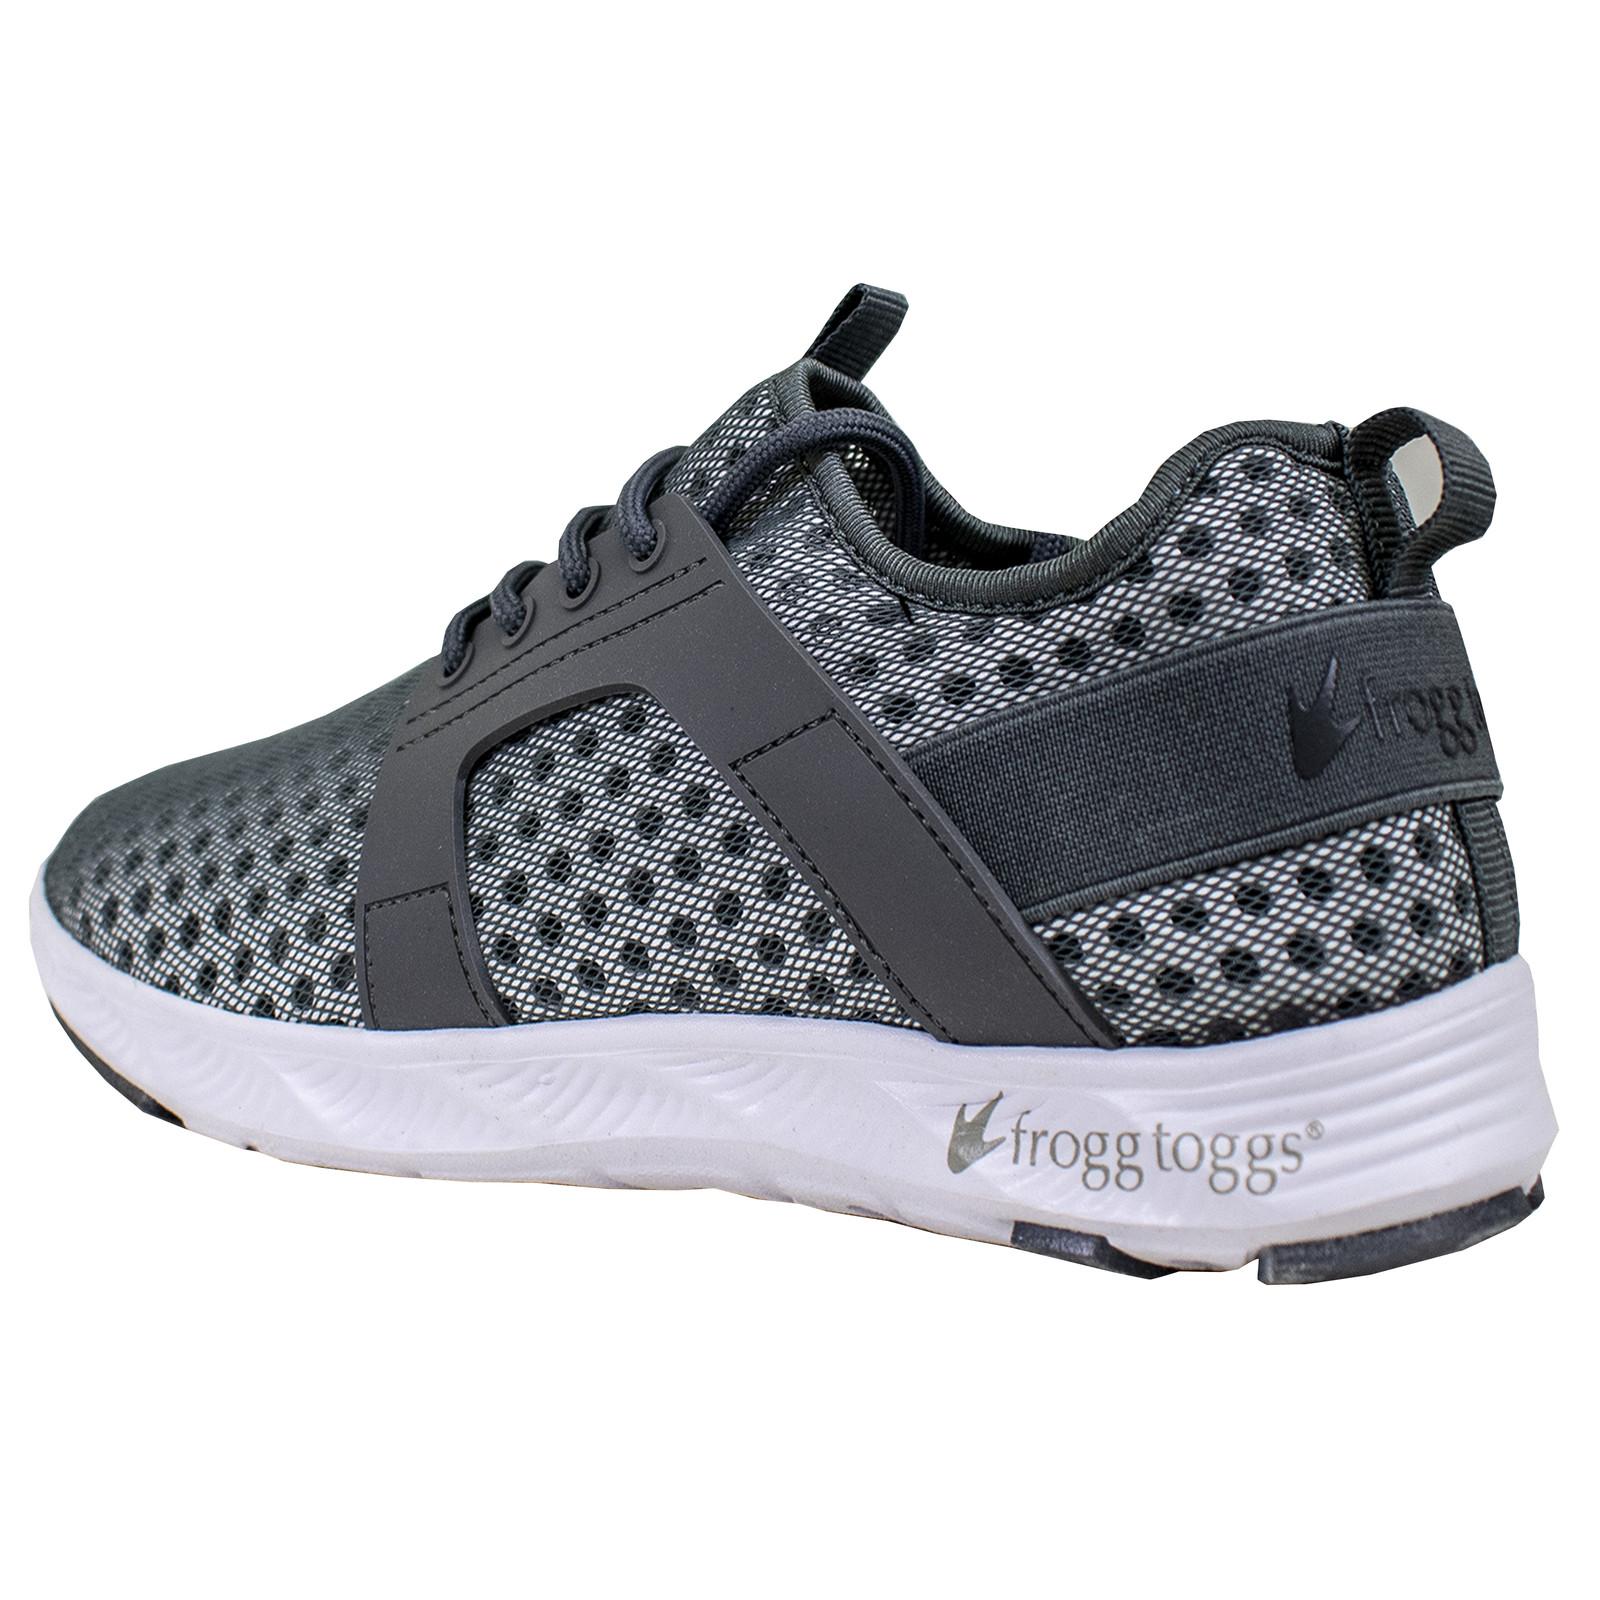 Women's Shortfin XTR Shoe Gray-large